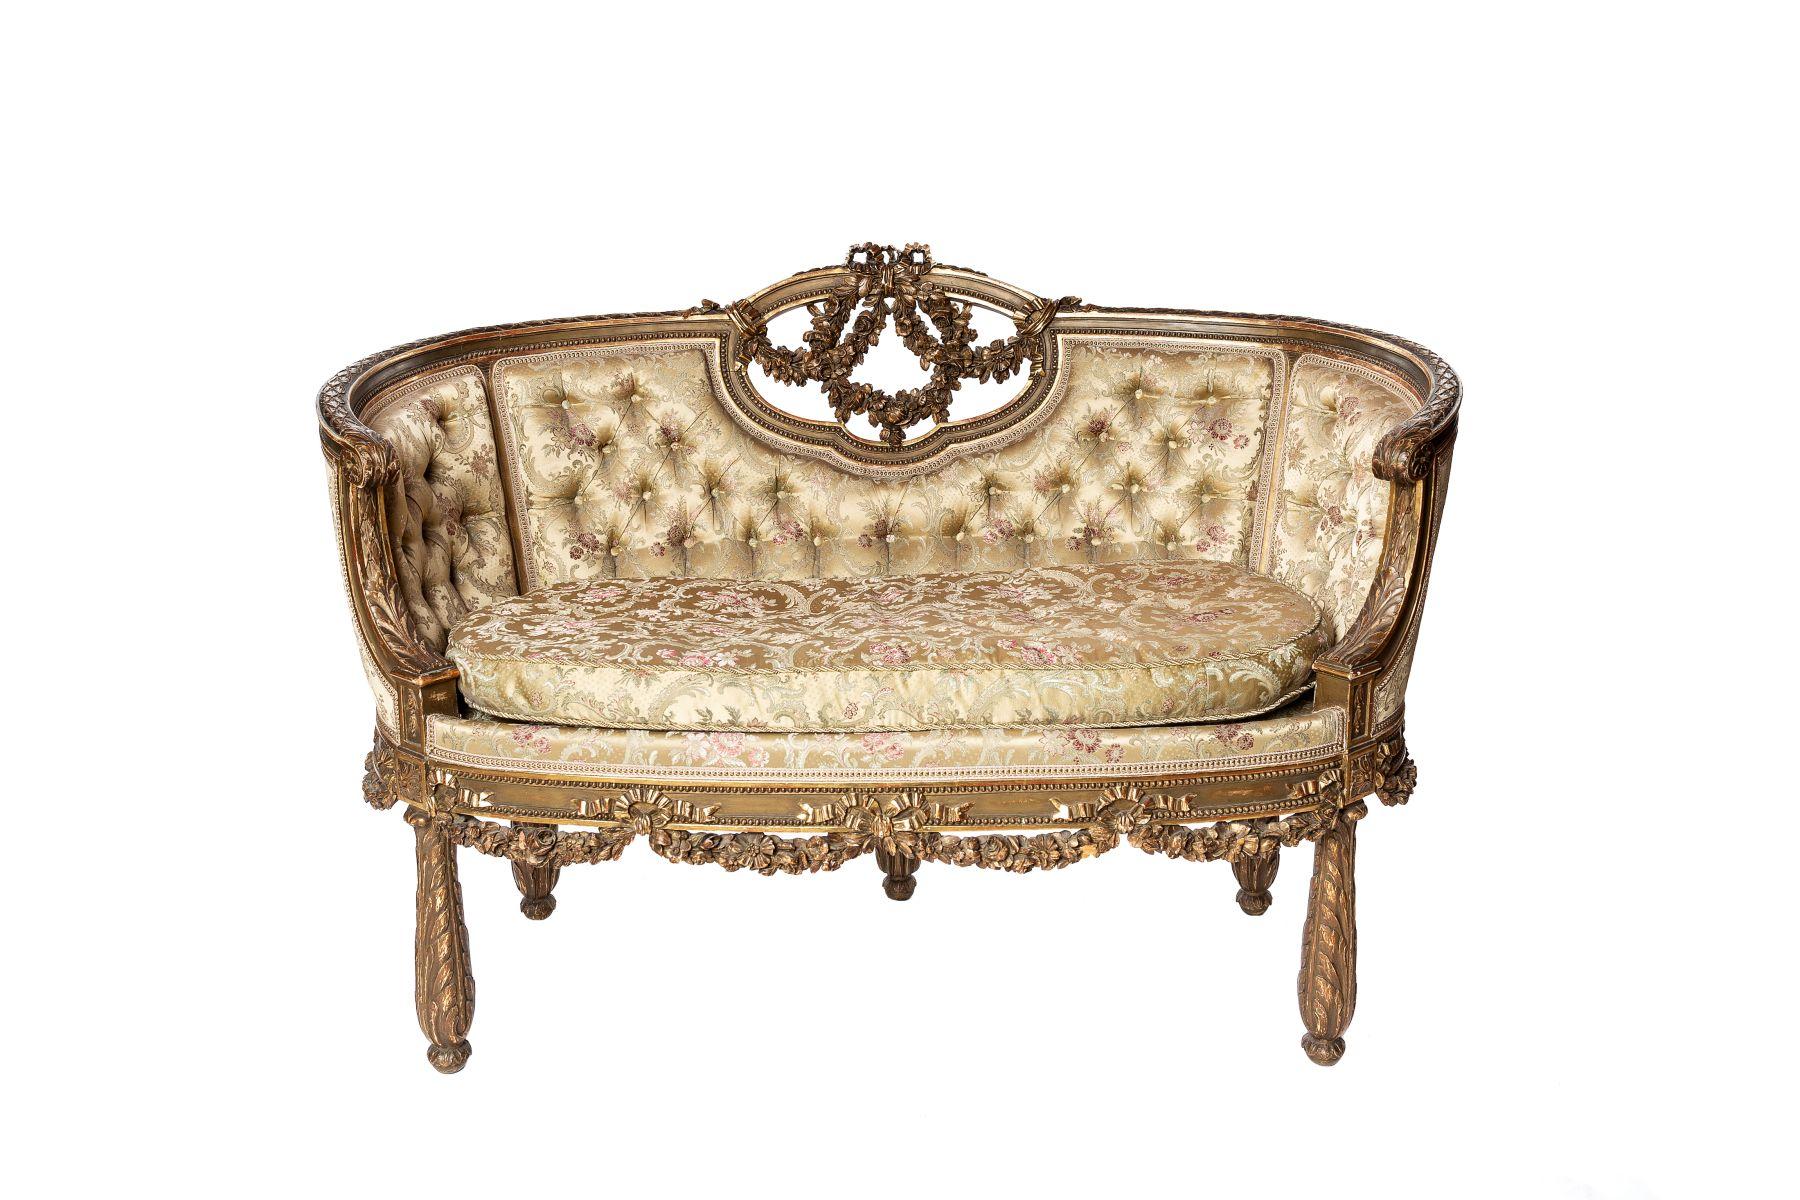 #162 Neo-Baroque bench | Neo-Barock Sitzbank Image